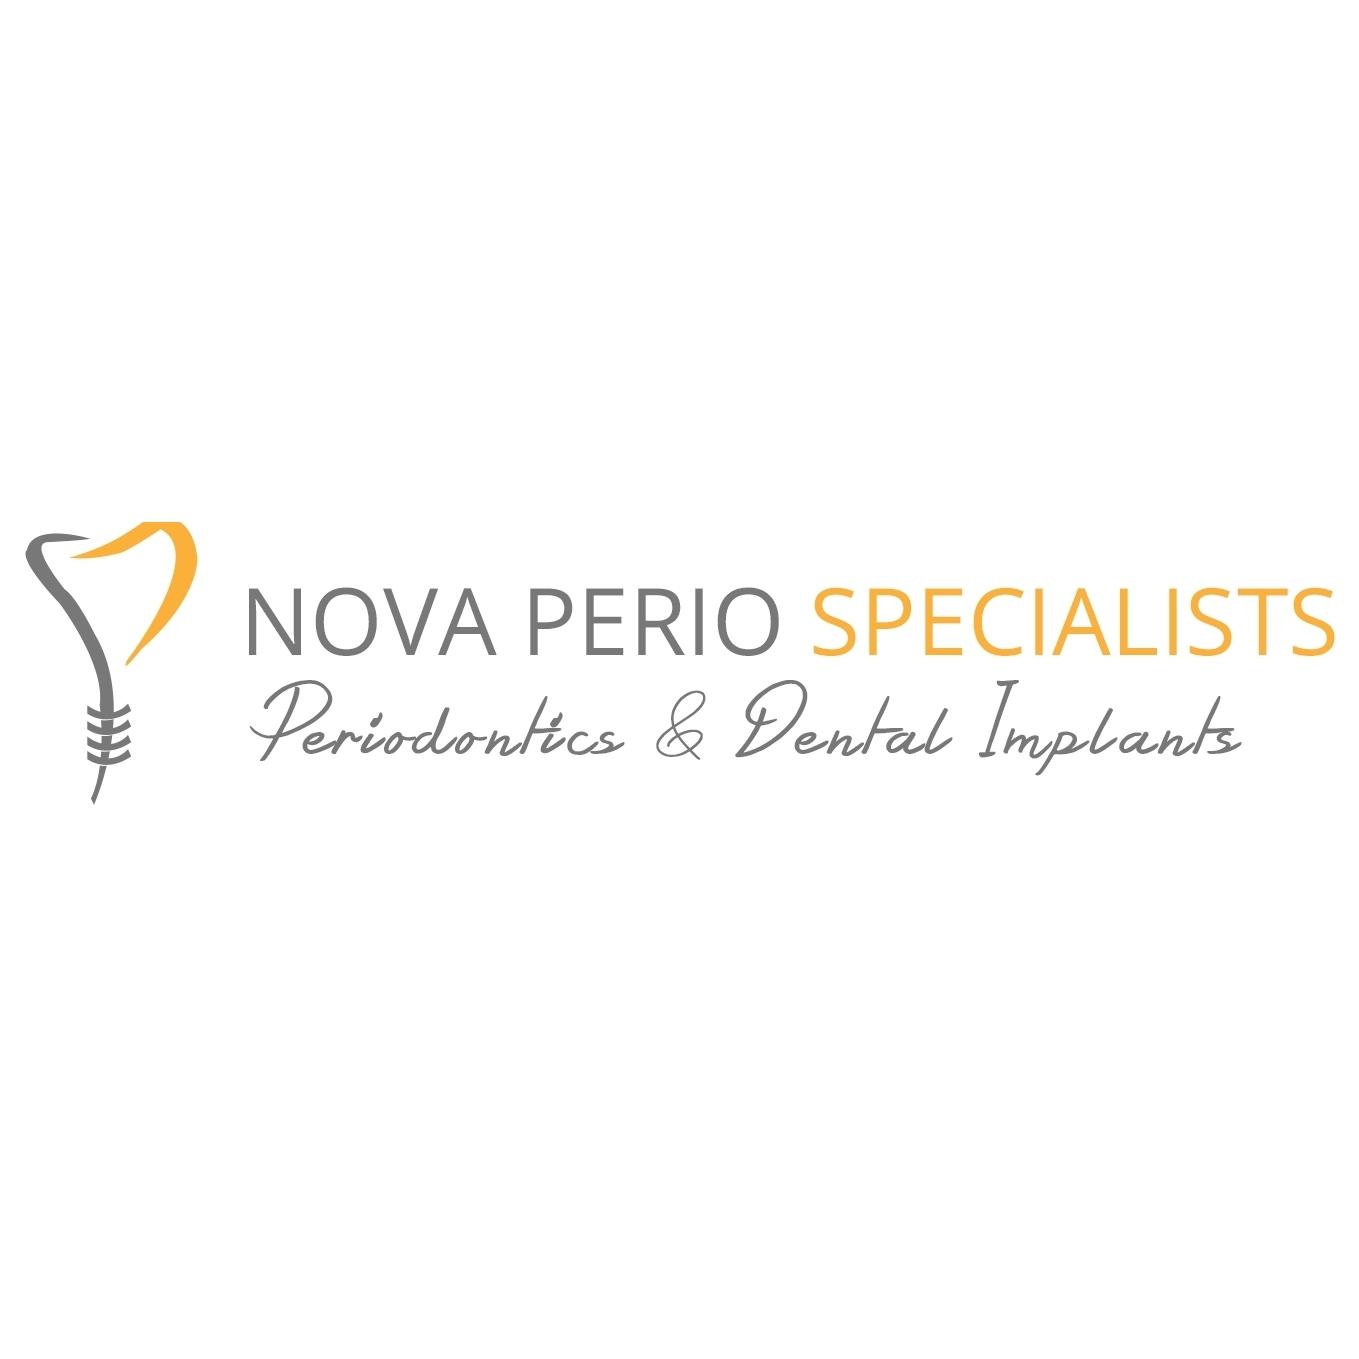 NOVA Perio Specialists-Periodontics